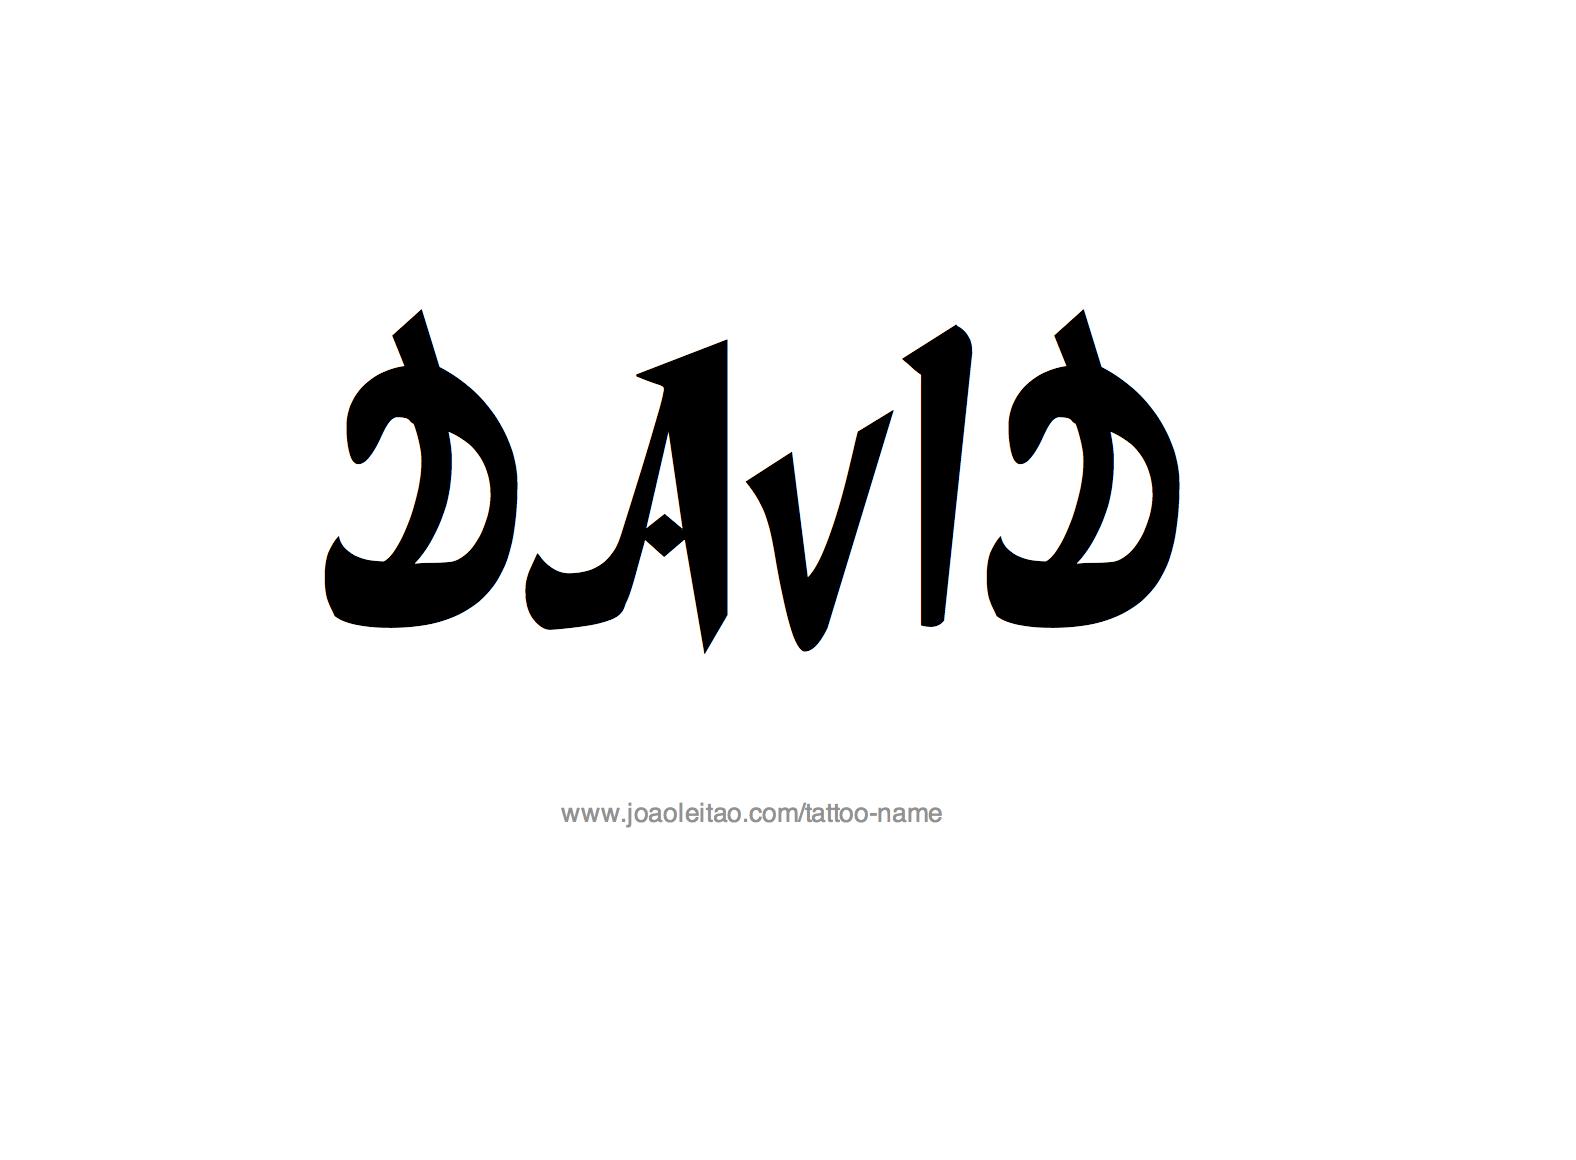 david name tattoo designs